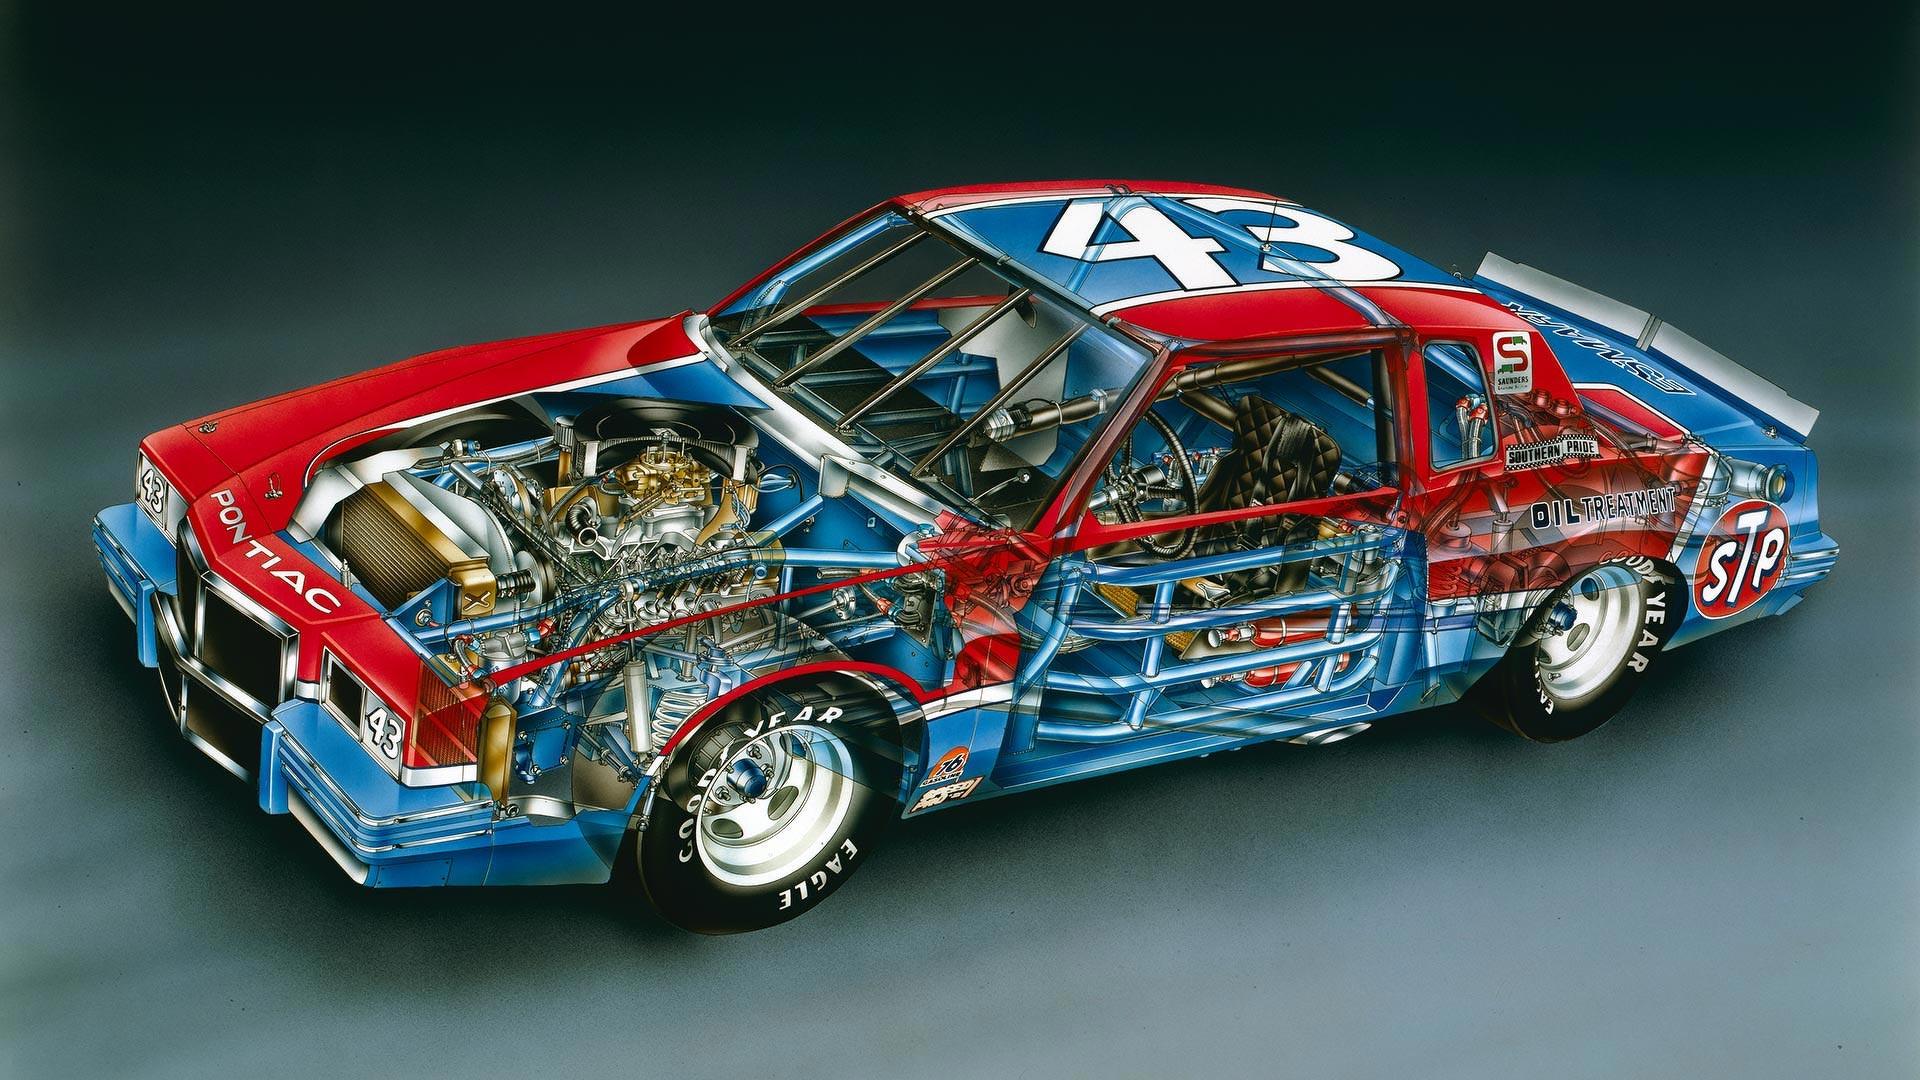 Pontiac Grand Prix cutaway